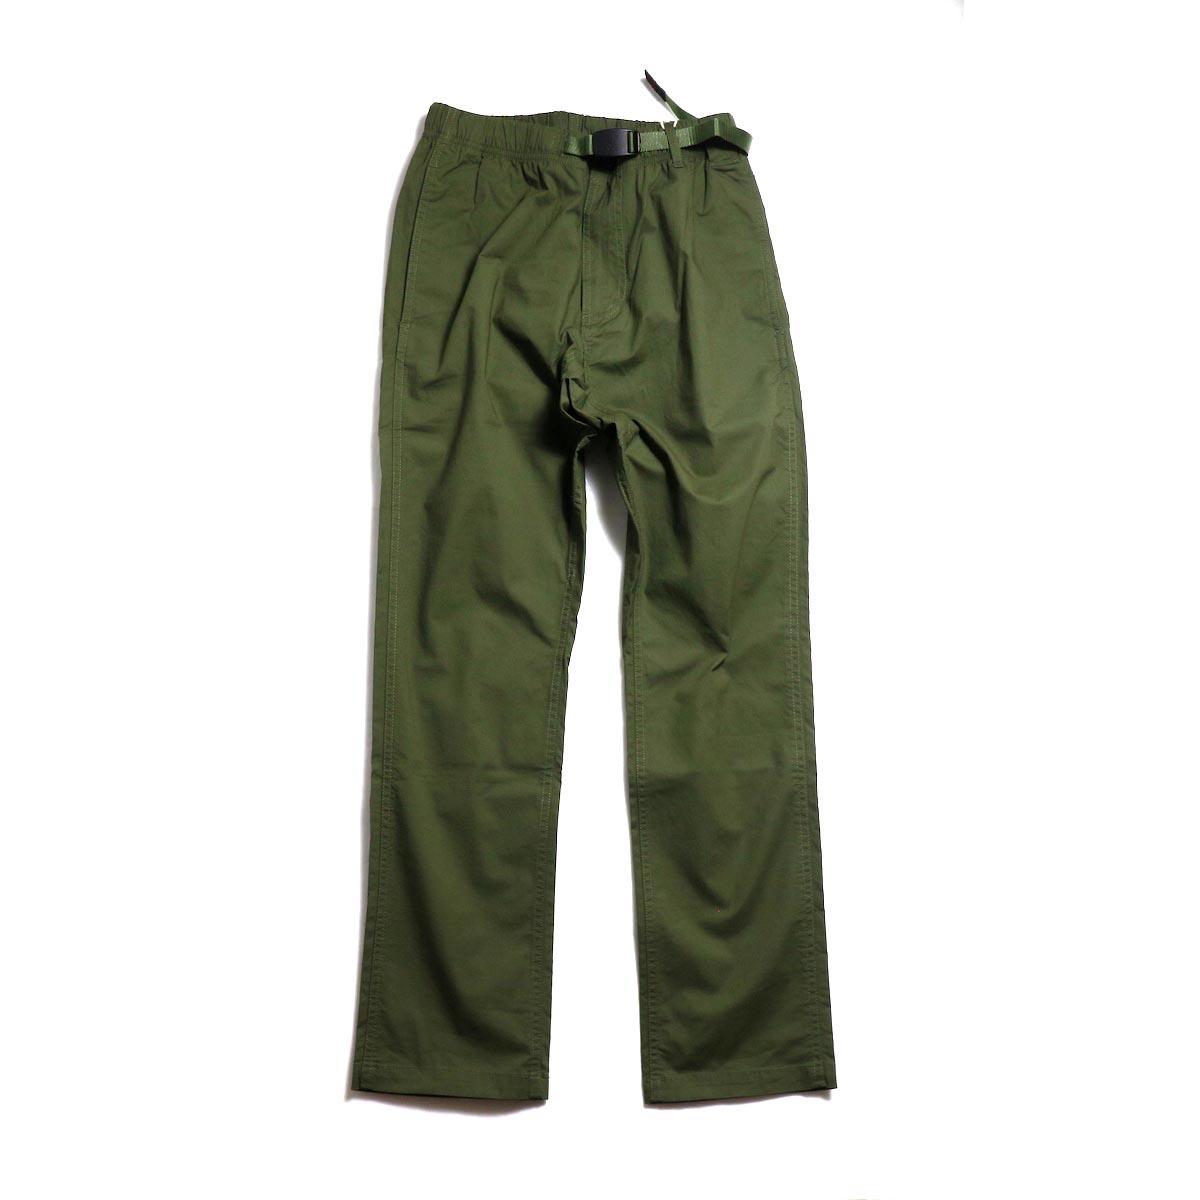 GRAMICCI / Weather NN-Pants Just Cut -Olive